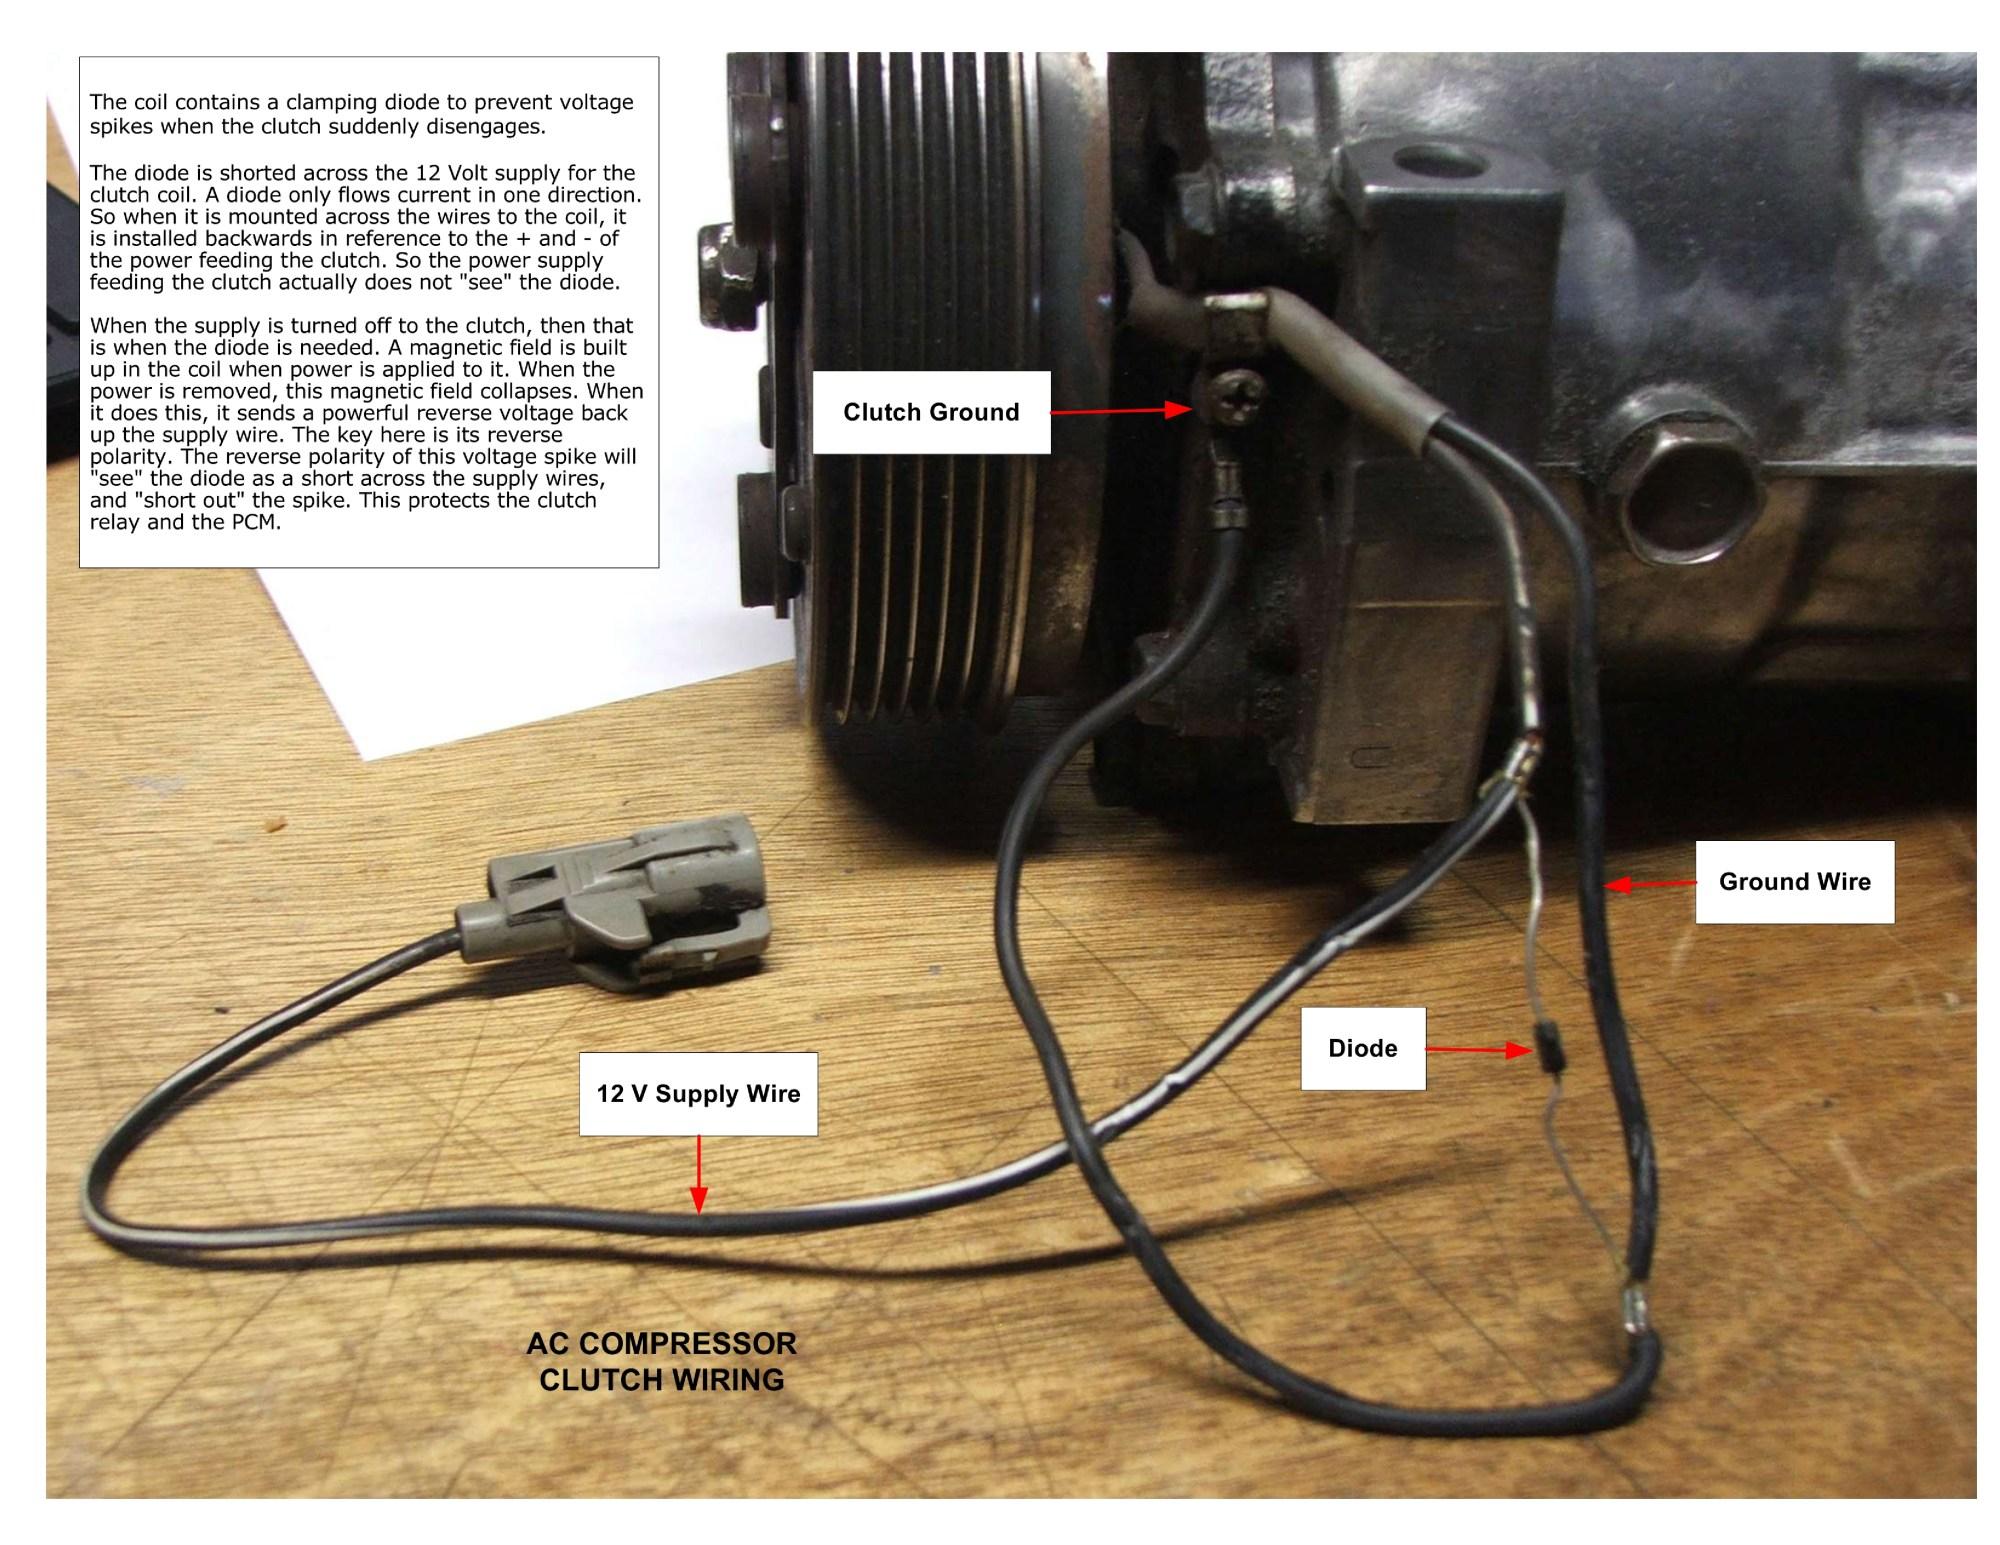 hight resolution of ac help i am electrically beyond stupid jeep cherokee forum rh cherokeeforum com compressor relay wiring